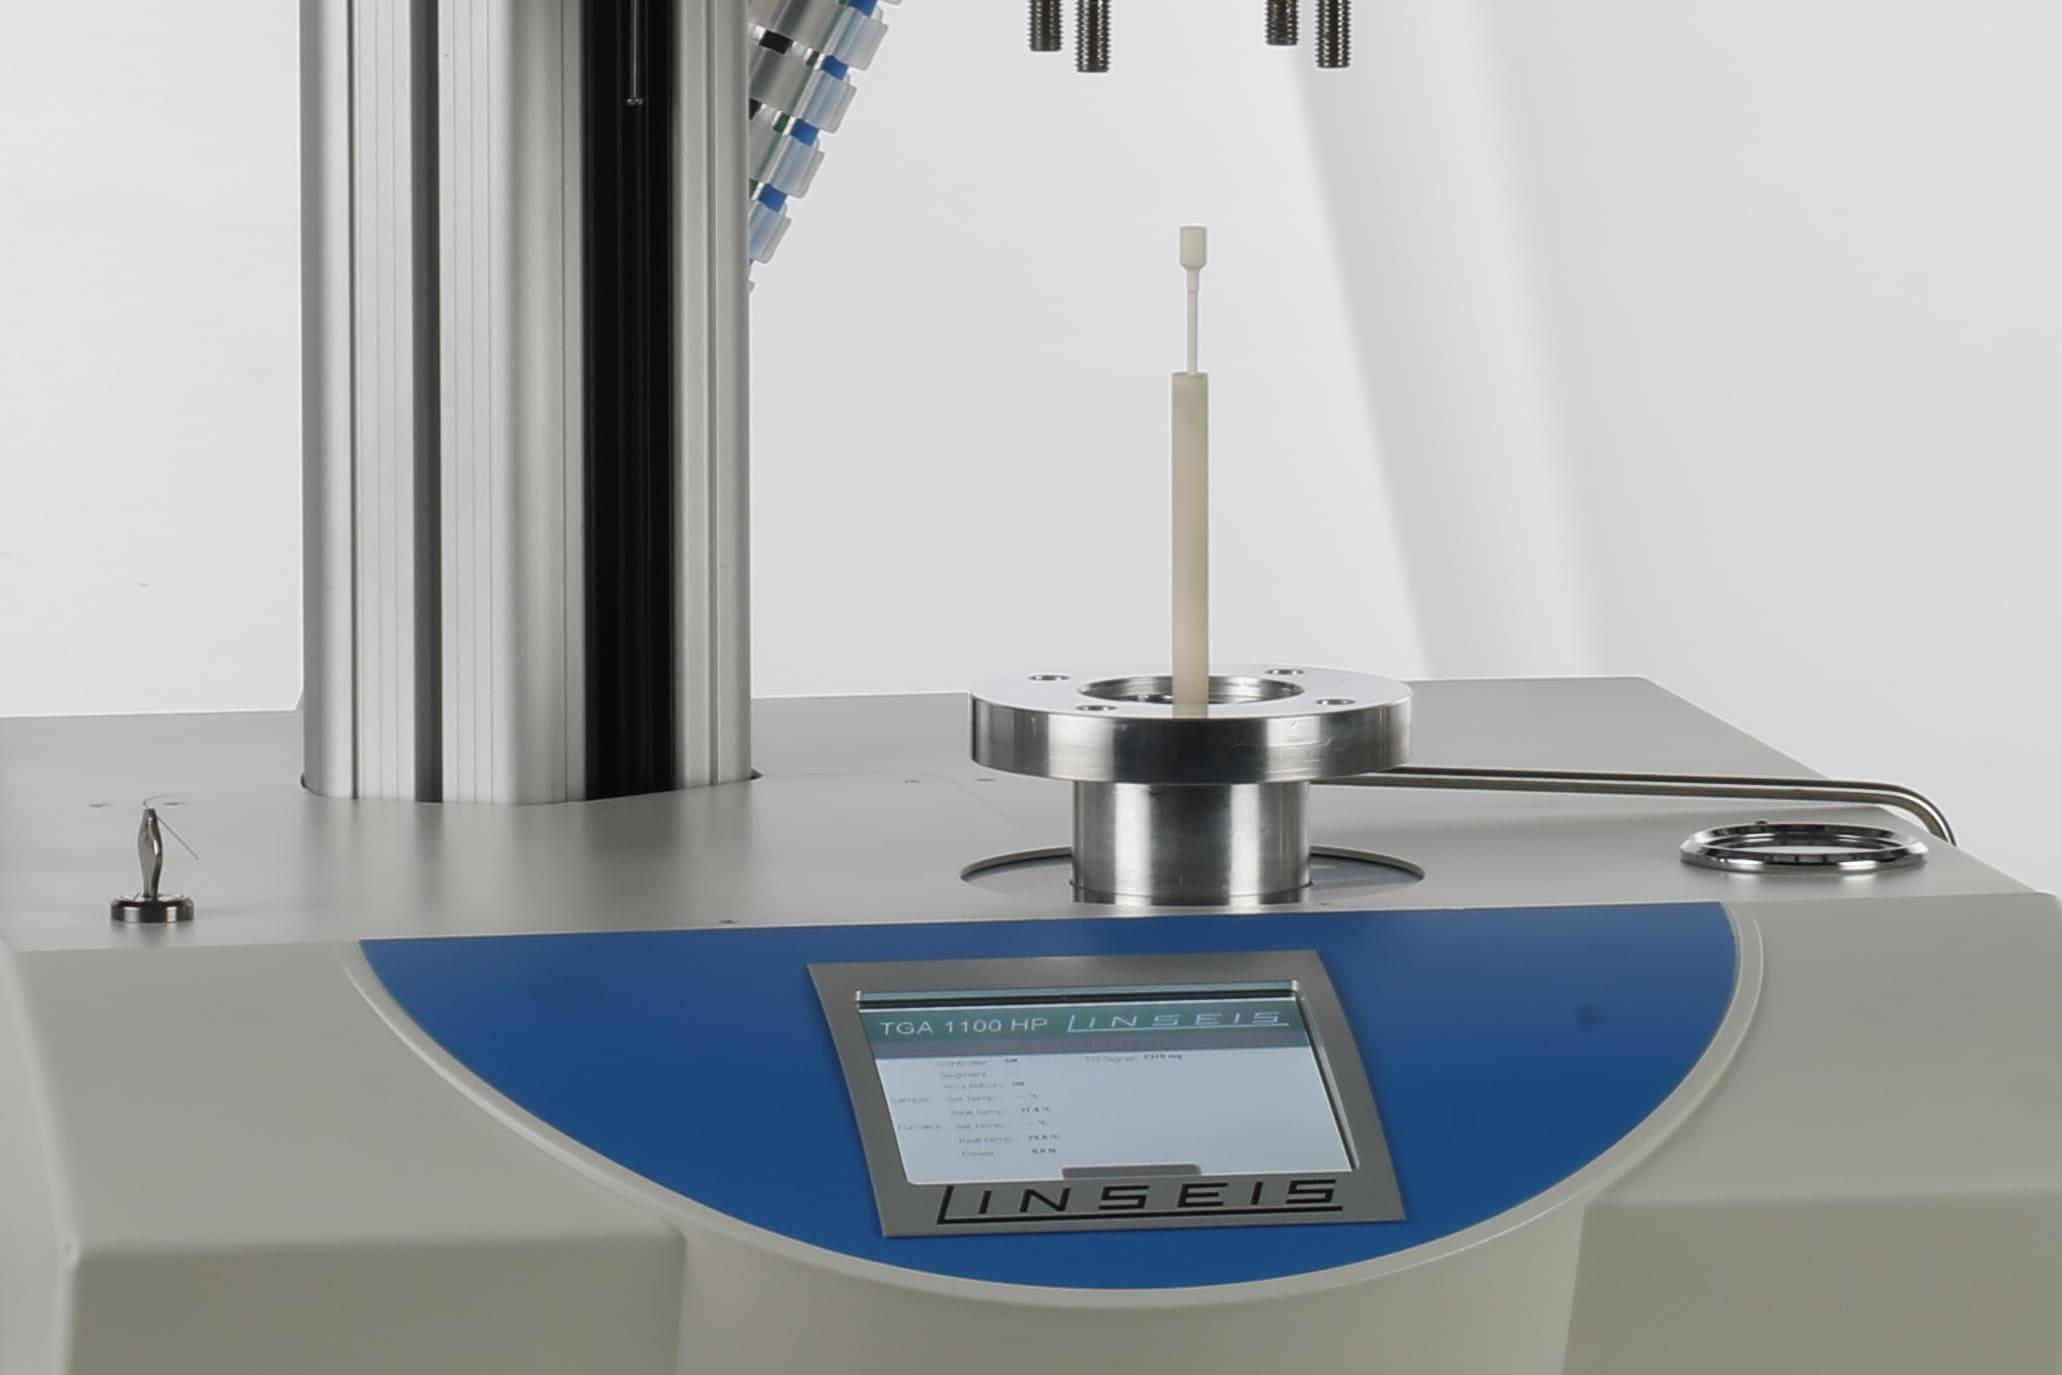 TGA STA HP 3 instrument sample holder / Probenhalter